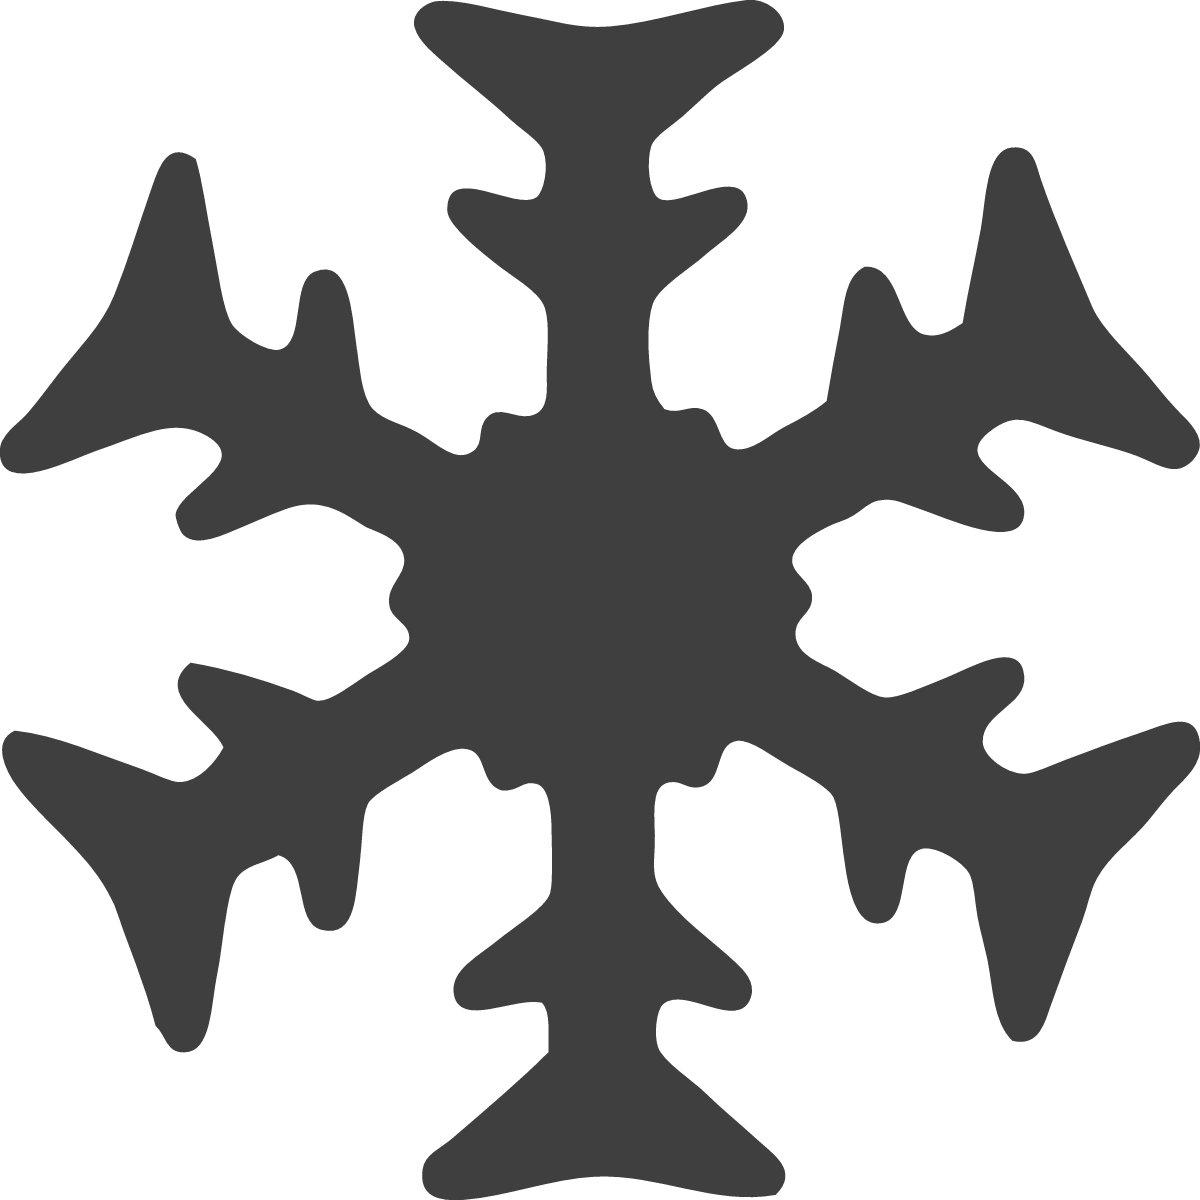 2,5 cm Heyda 203687703 Heyda 203687703 Motivstanzer gro/ß Motivgr/ö/ße: ca Motiv: Vogel